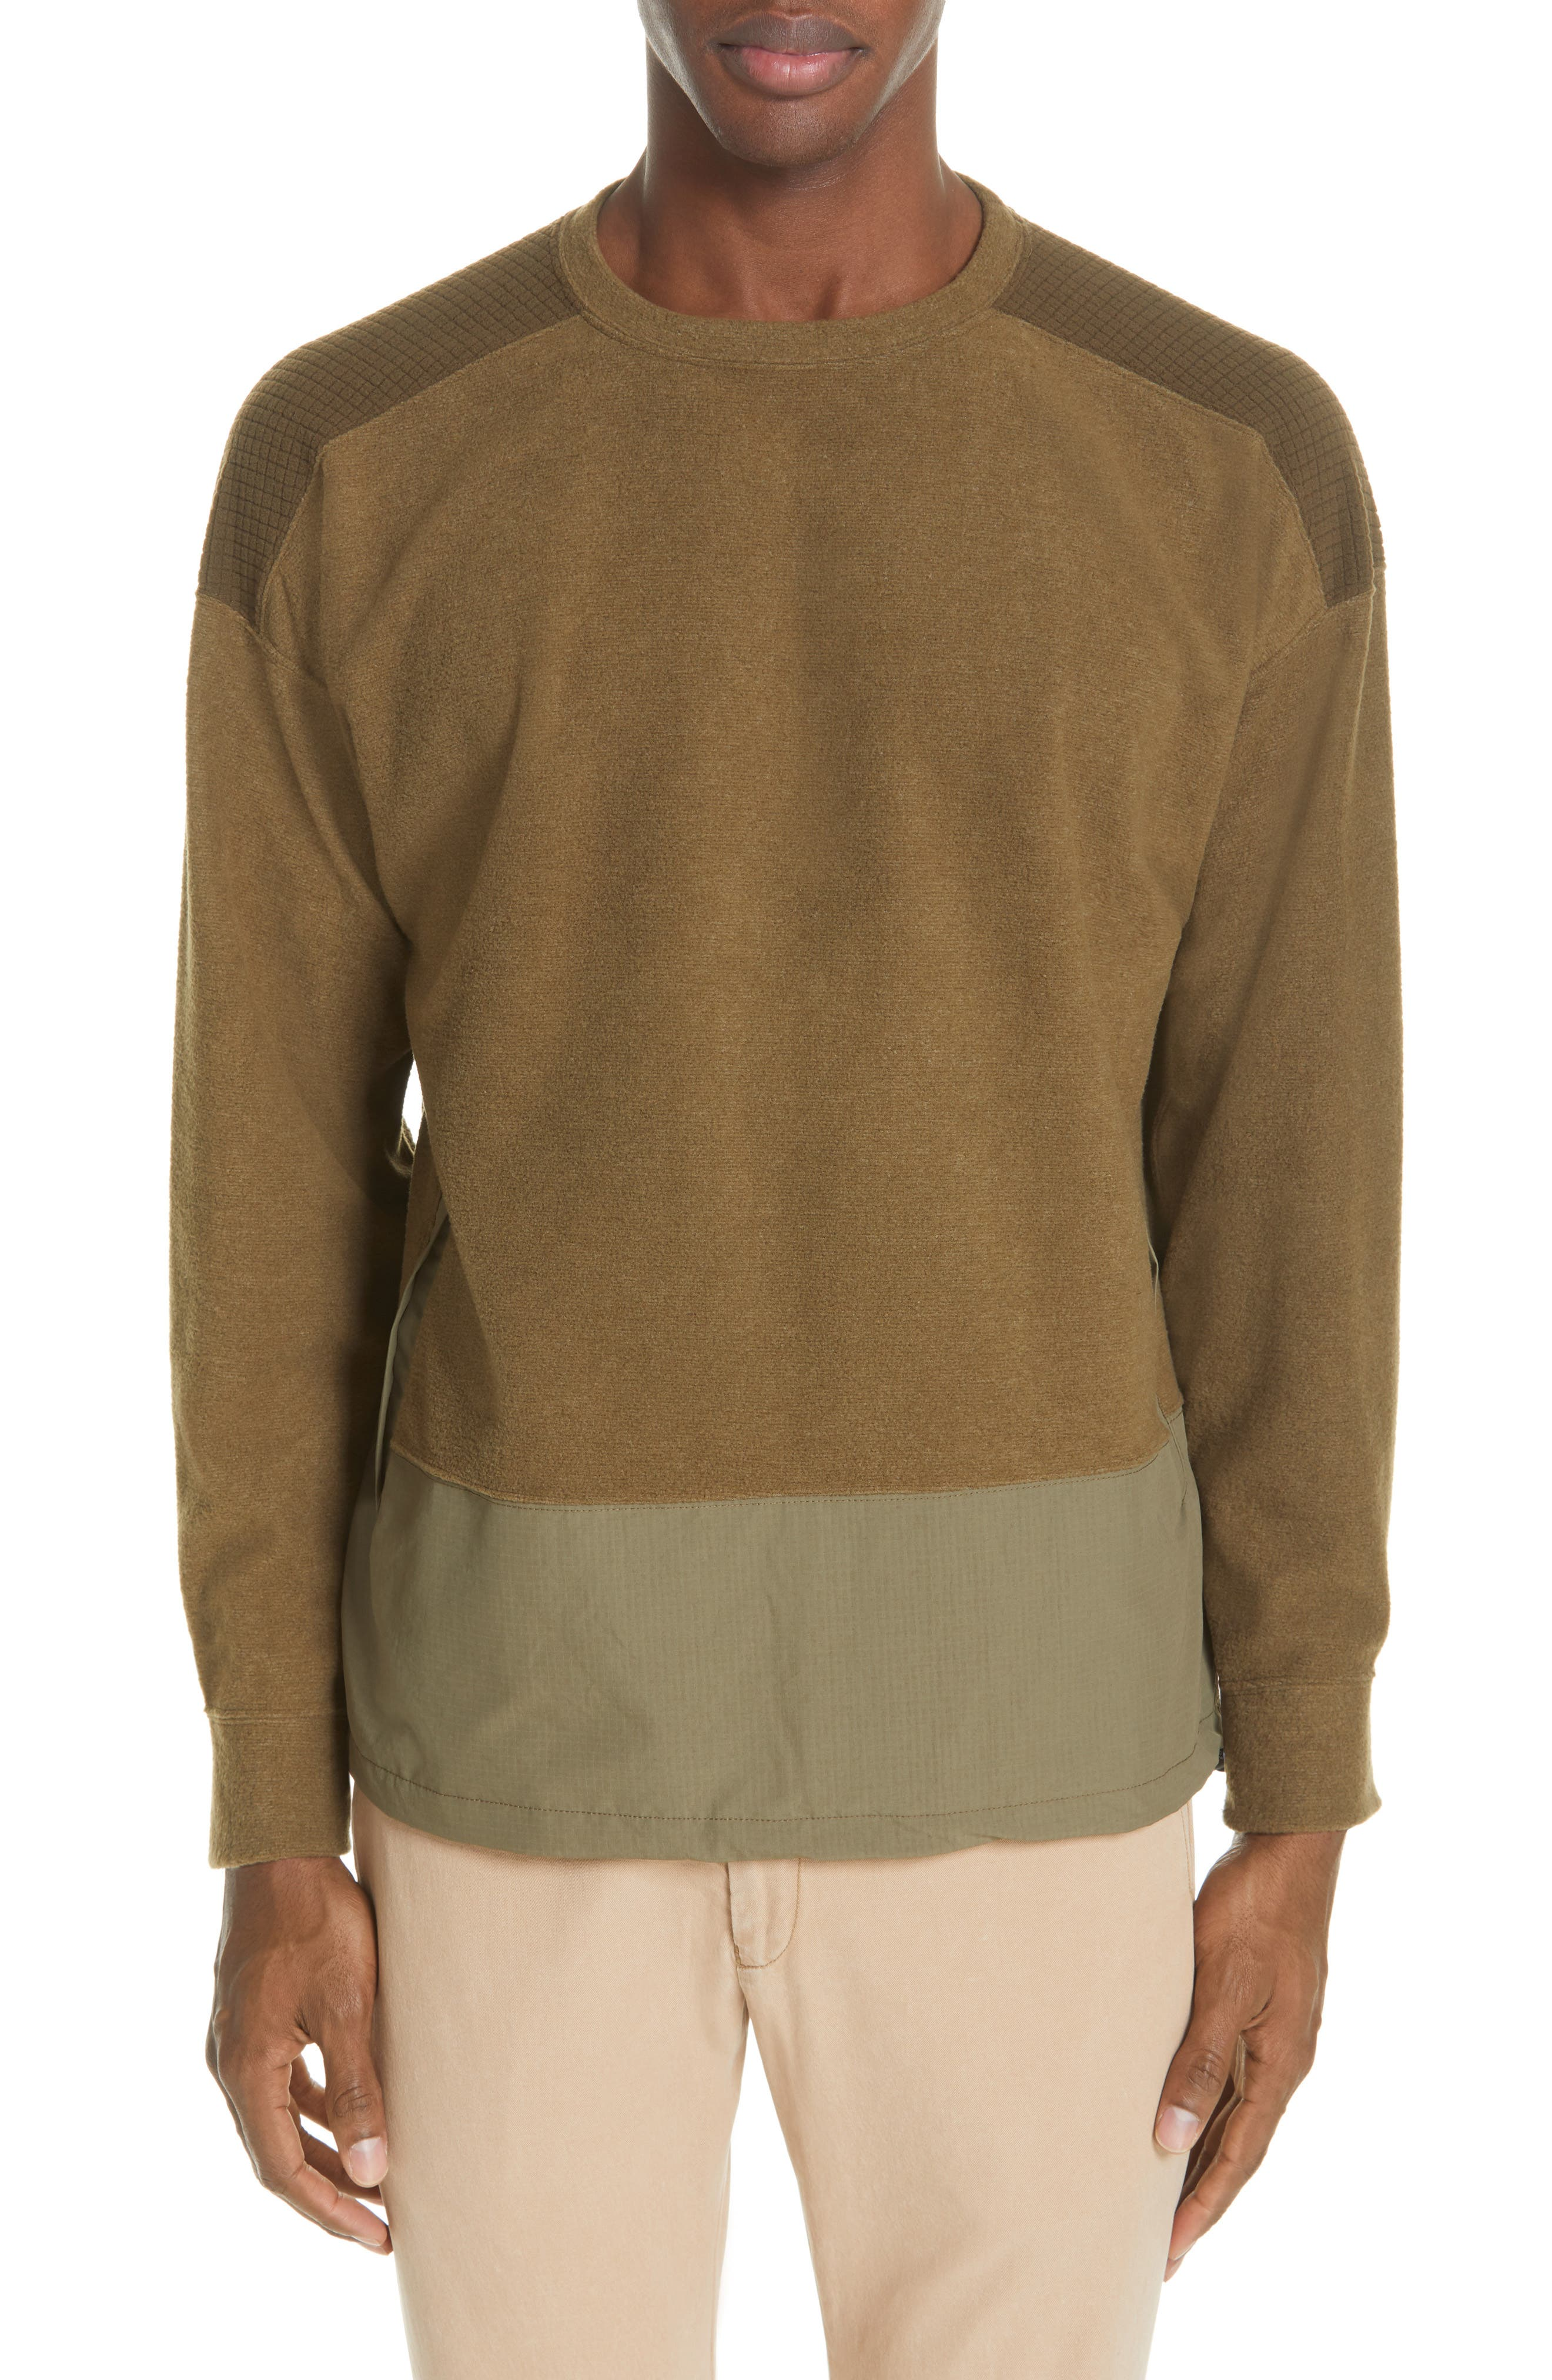 Remi Relief Ripstop Border Fleece Pullover